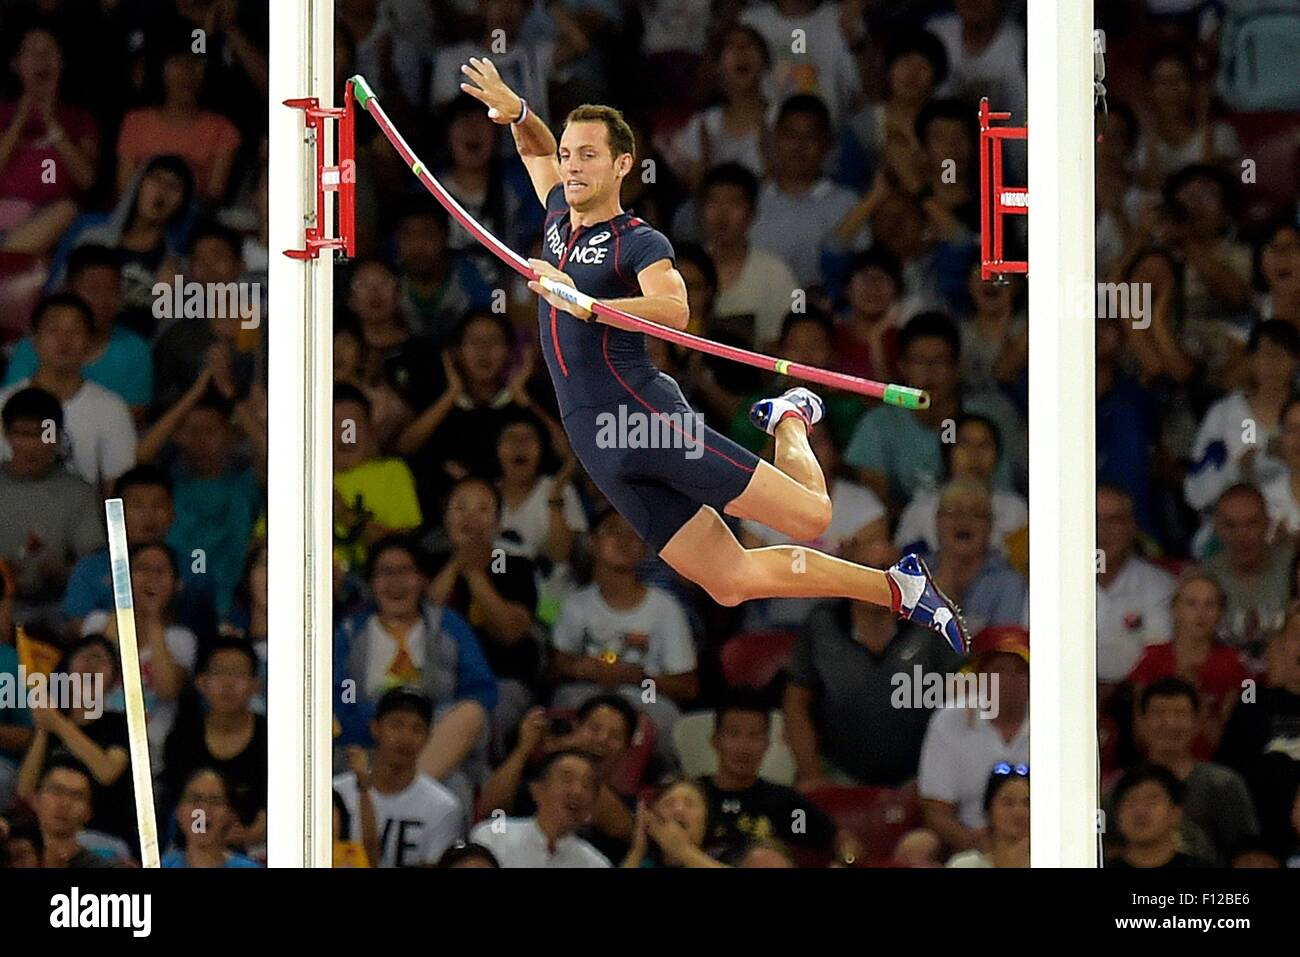 Beijing, China. 24th Aug, 2015. 15th International Association of Athletics Federations (IAAF) Athletics World Championships - Stock Image